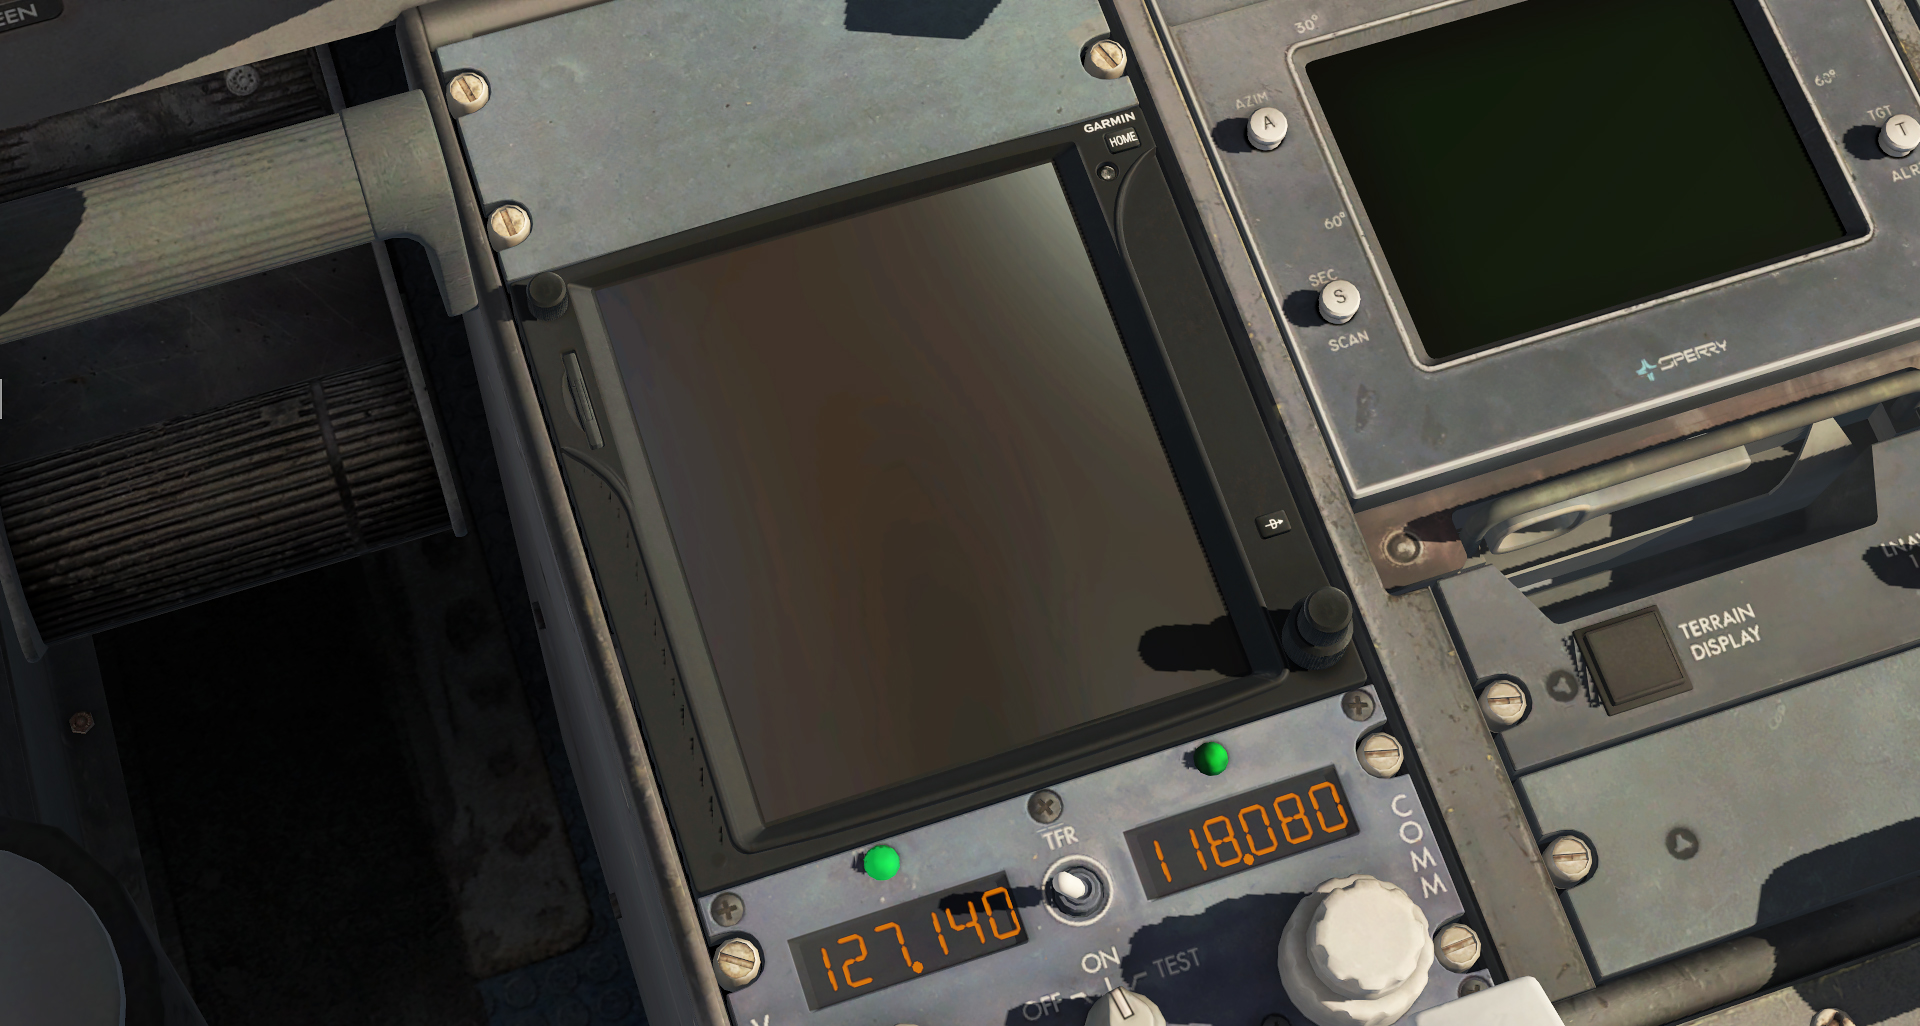 146 Professional for X-Plane 11 - Custom FMC